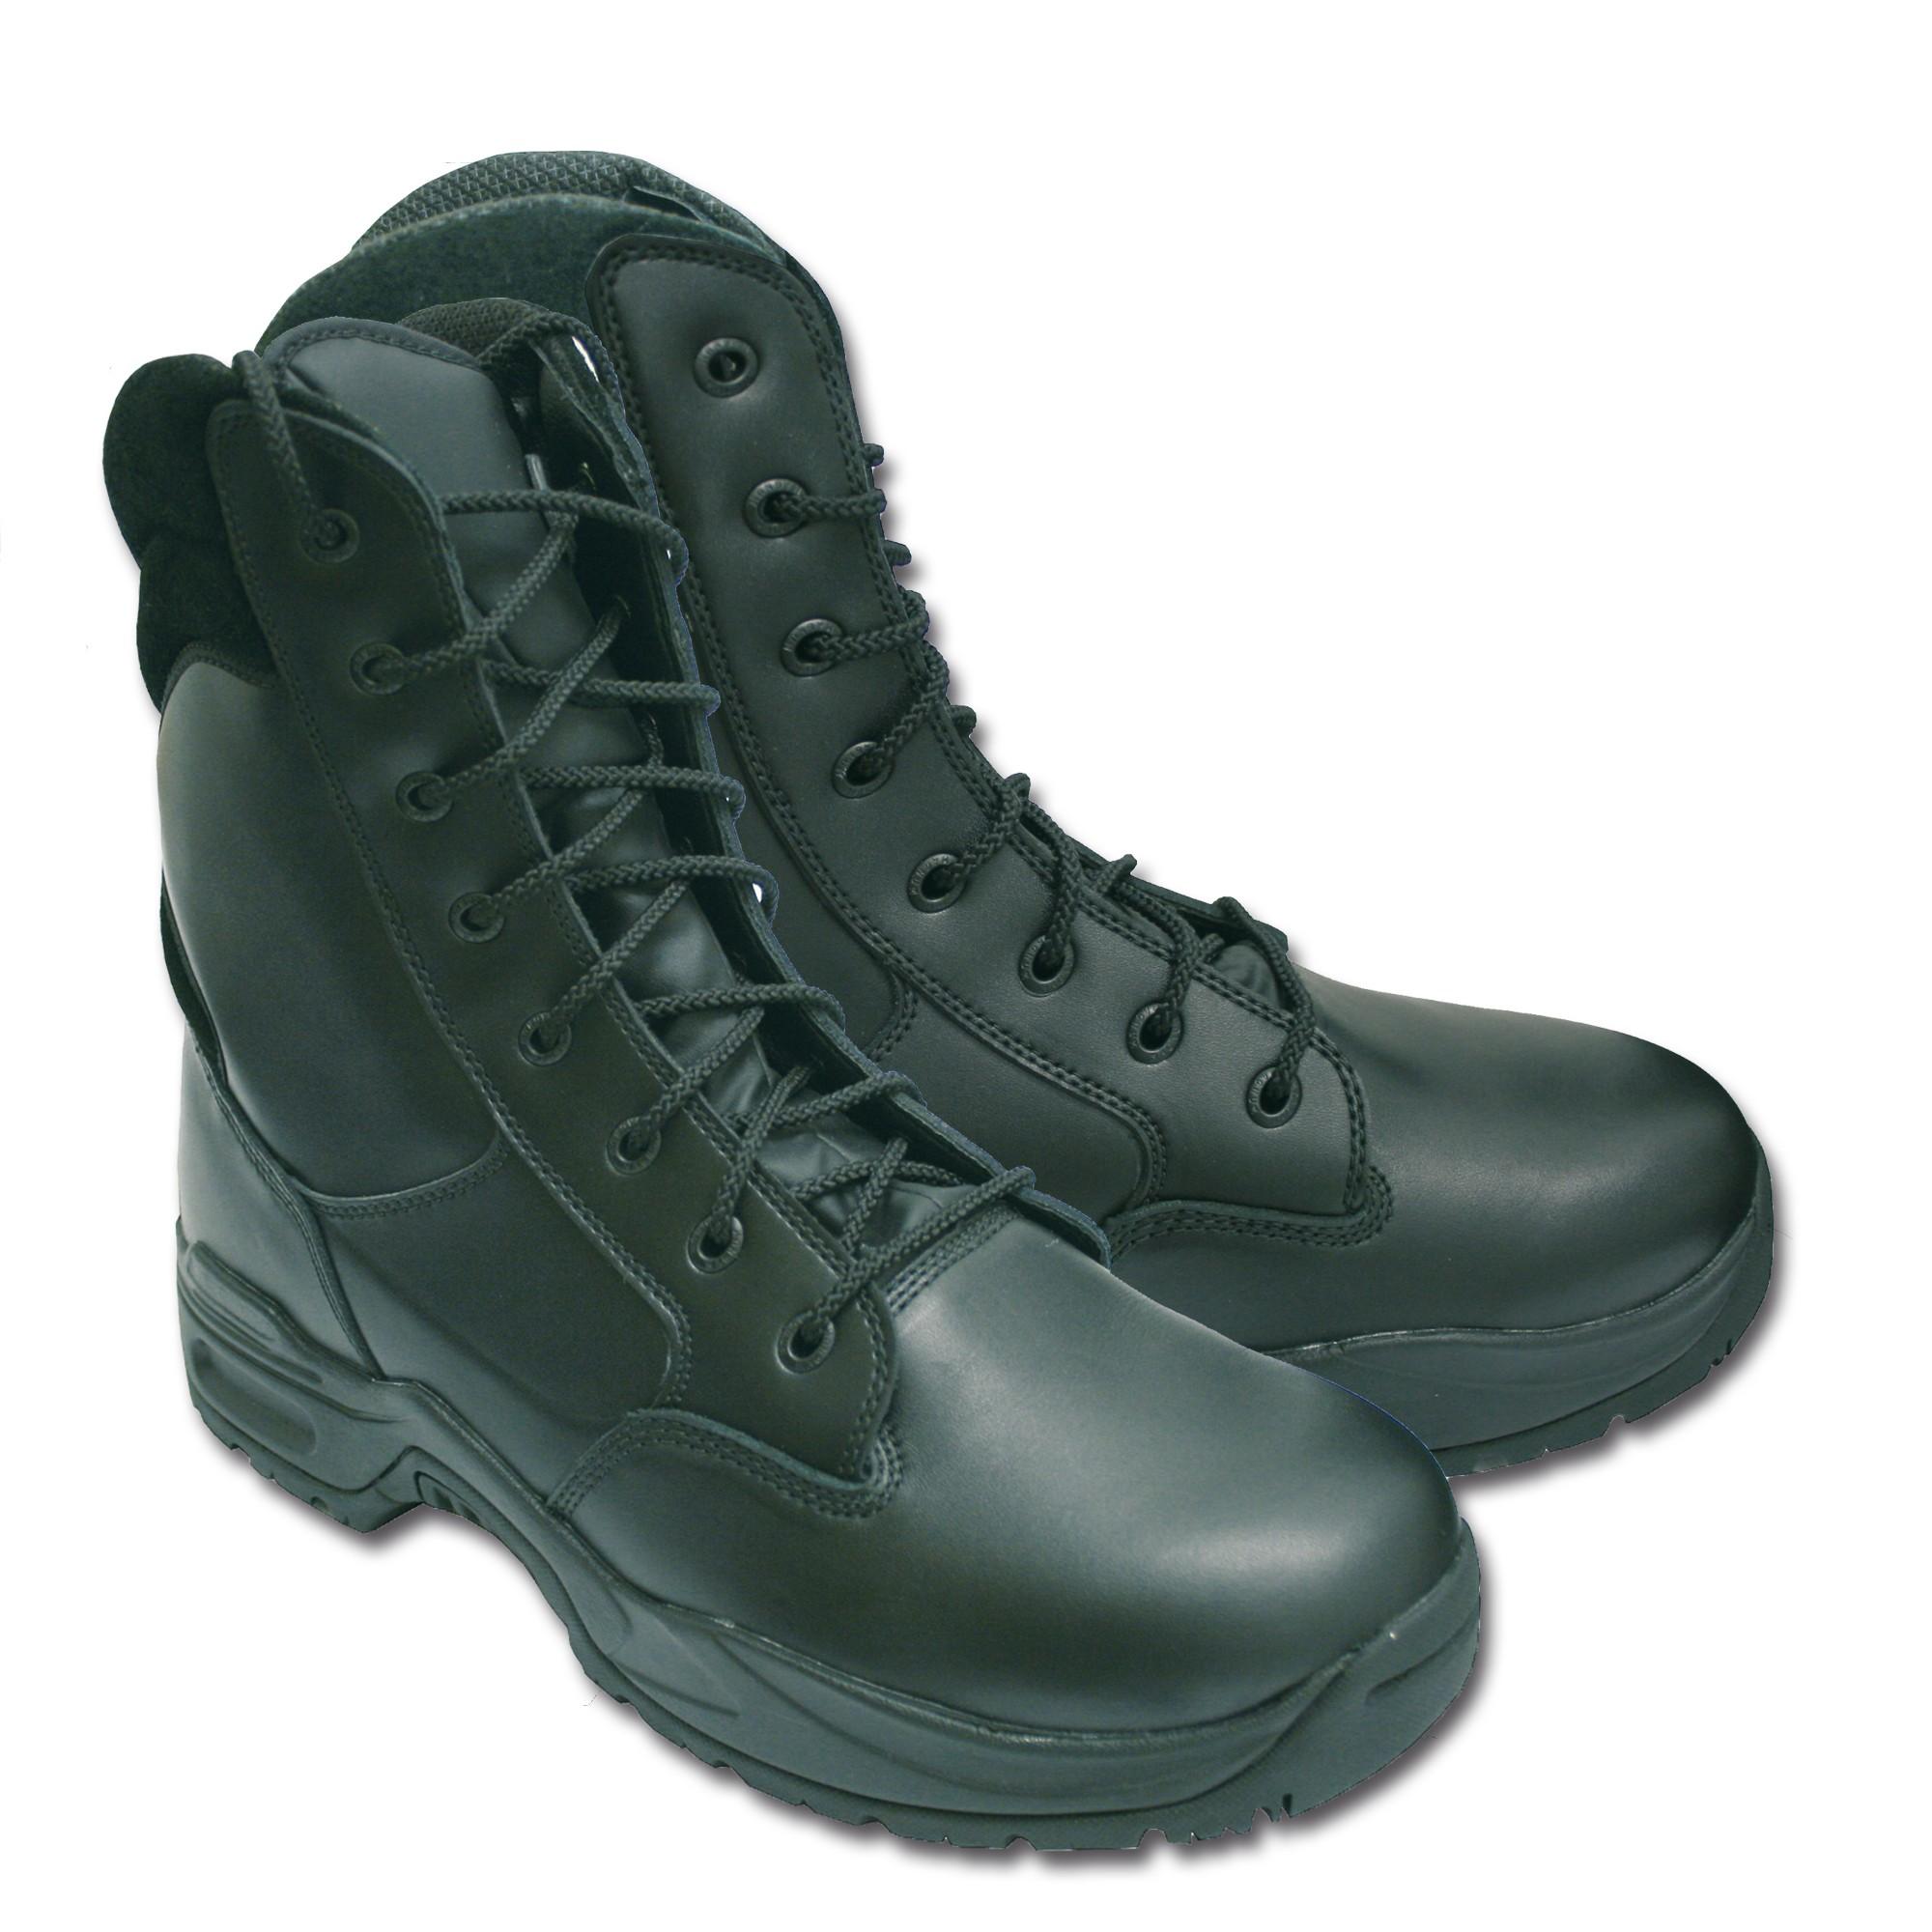 Boots Magnum Hi-Tec Stealth II Leather